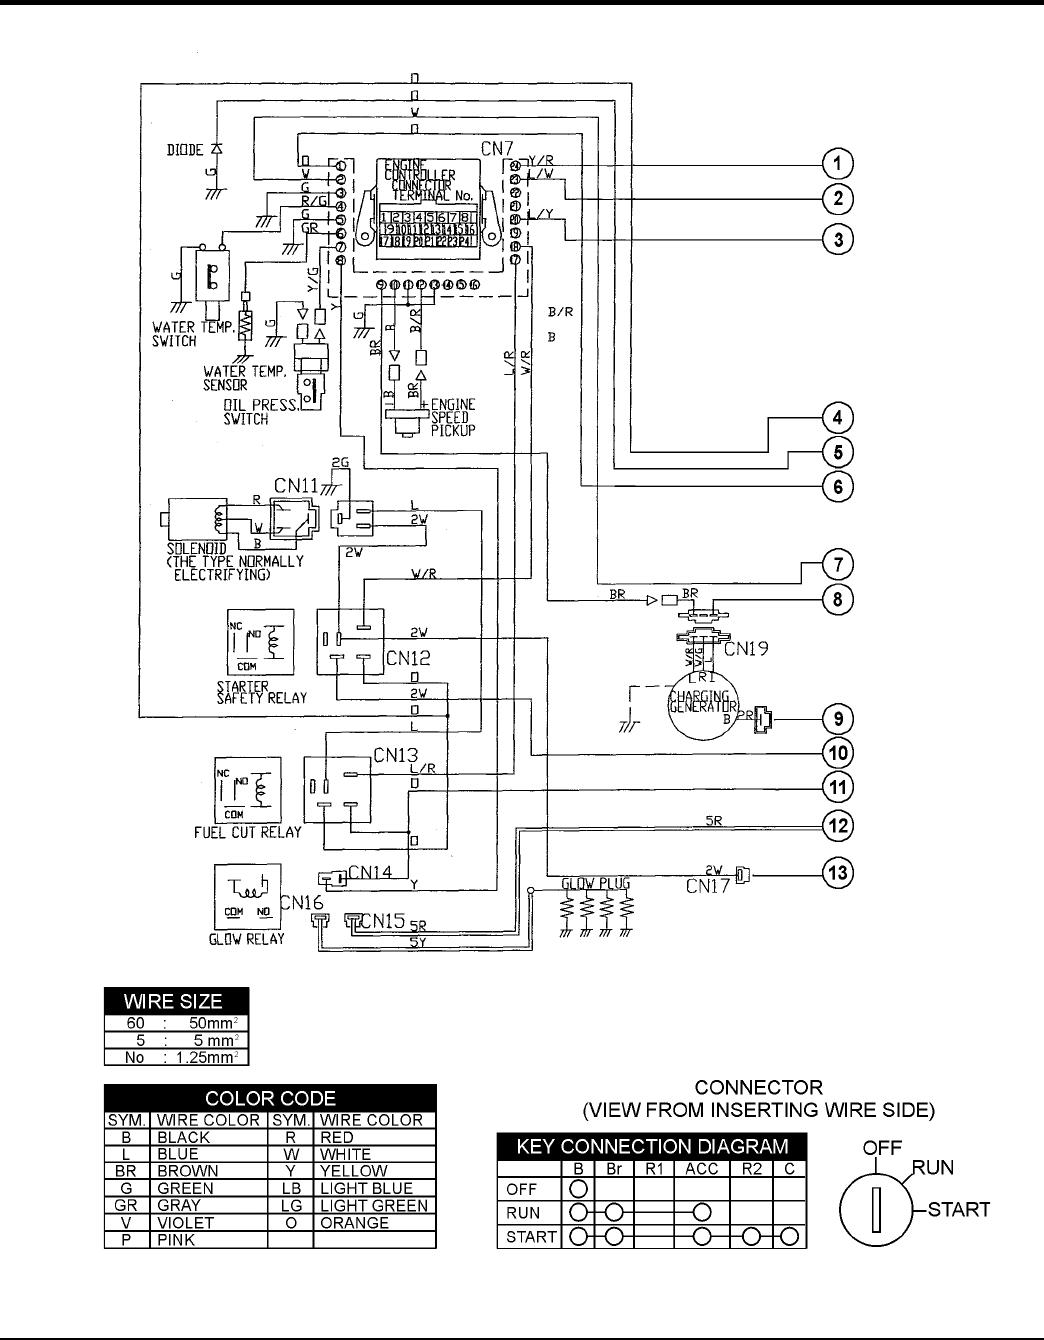 Multiquip mq power 60hz whisperwatt generator dca25usi users manual generator wiring diagram page 44 dca25usi 60 hz generator operation and parts manual rev 3 071911 asfbconference2016 Choice Image